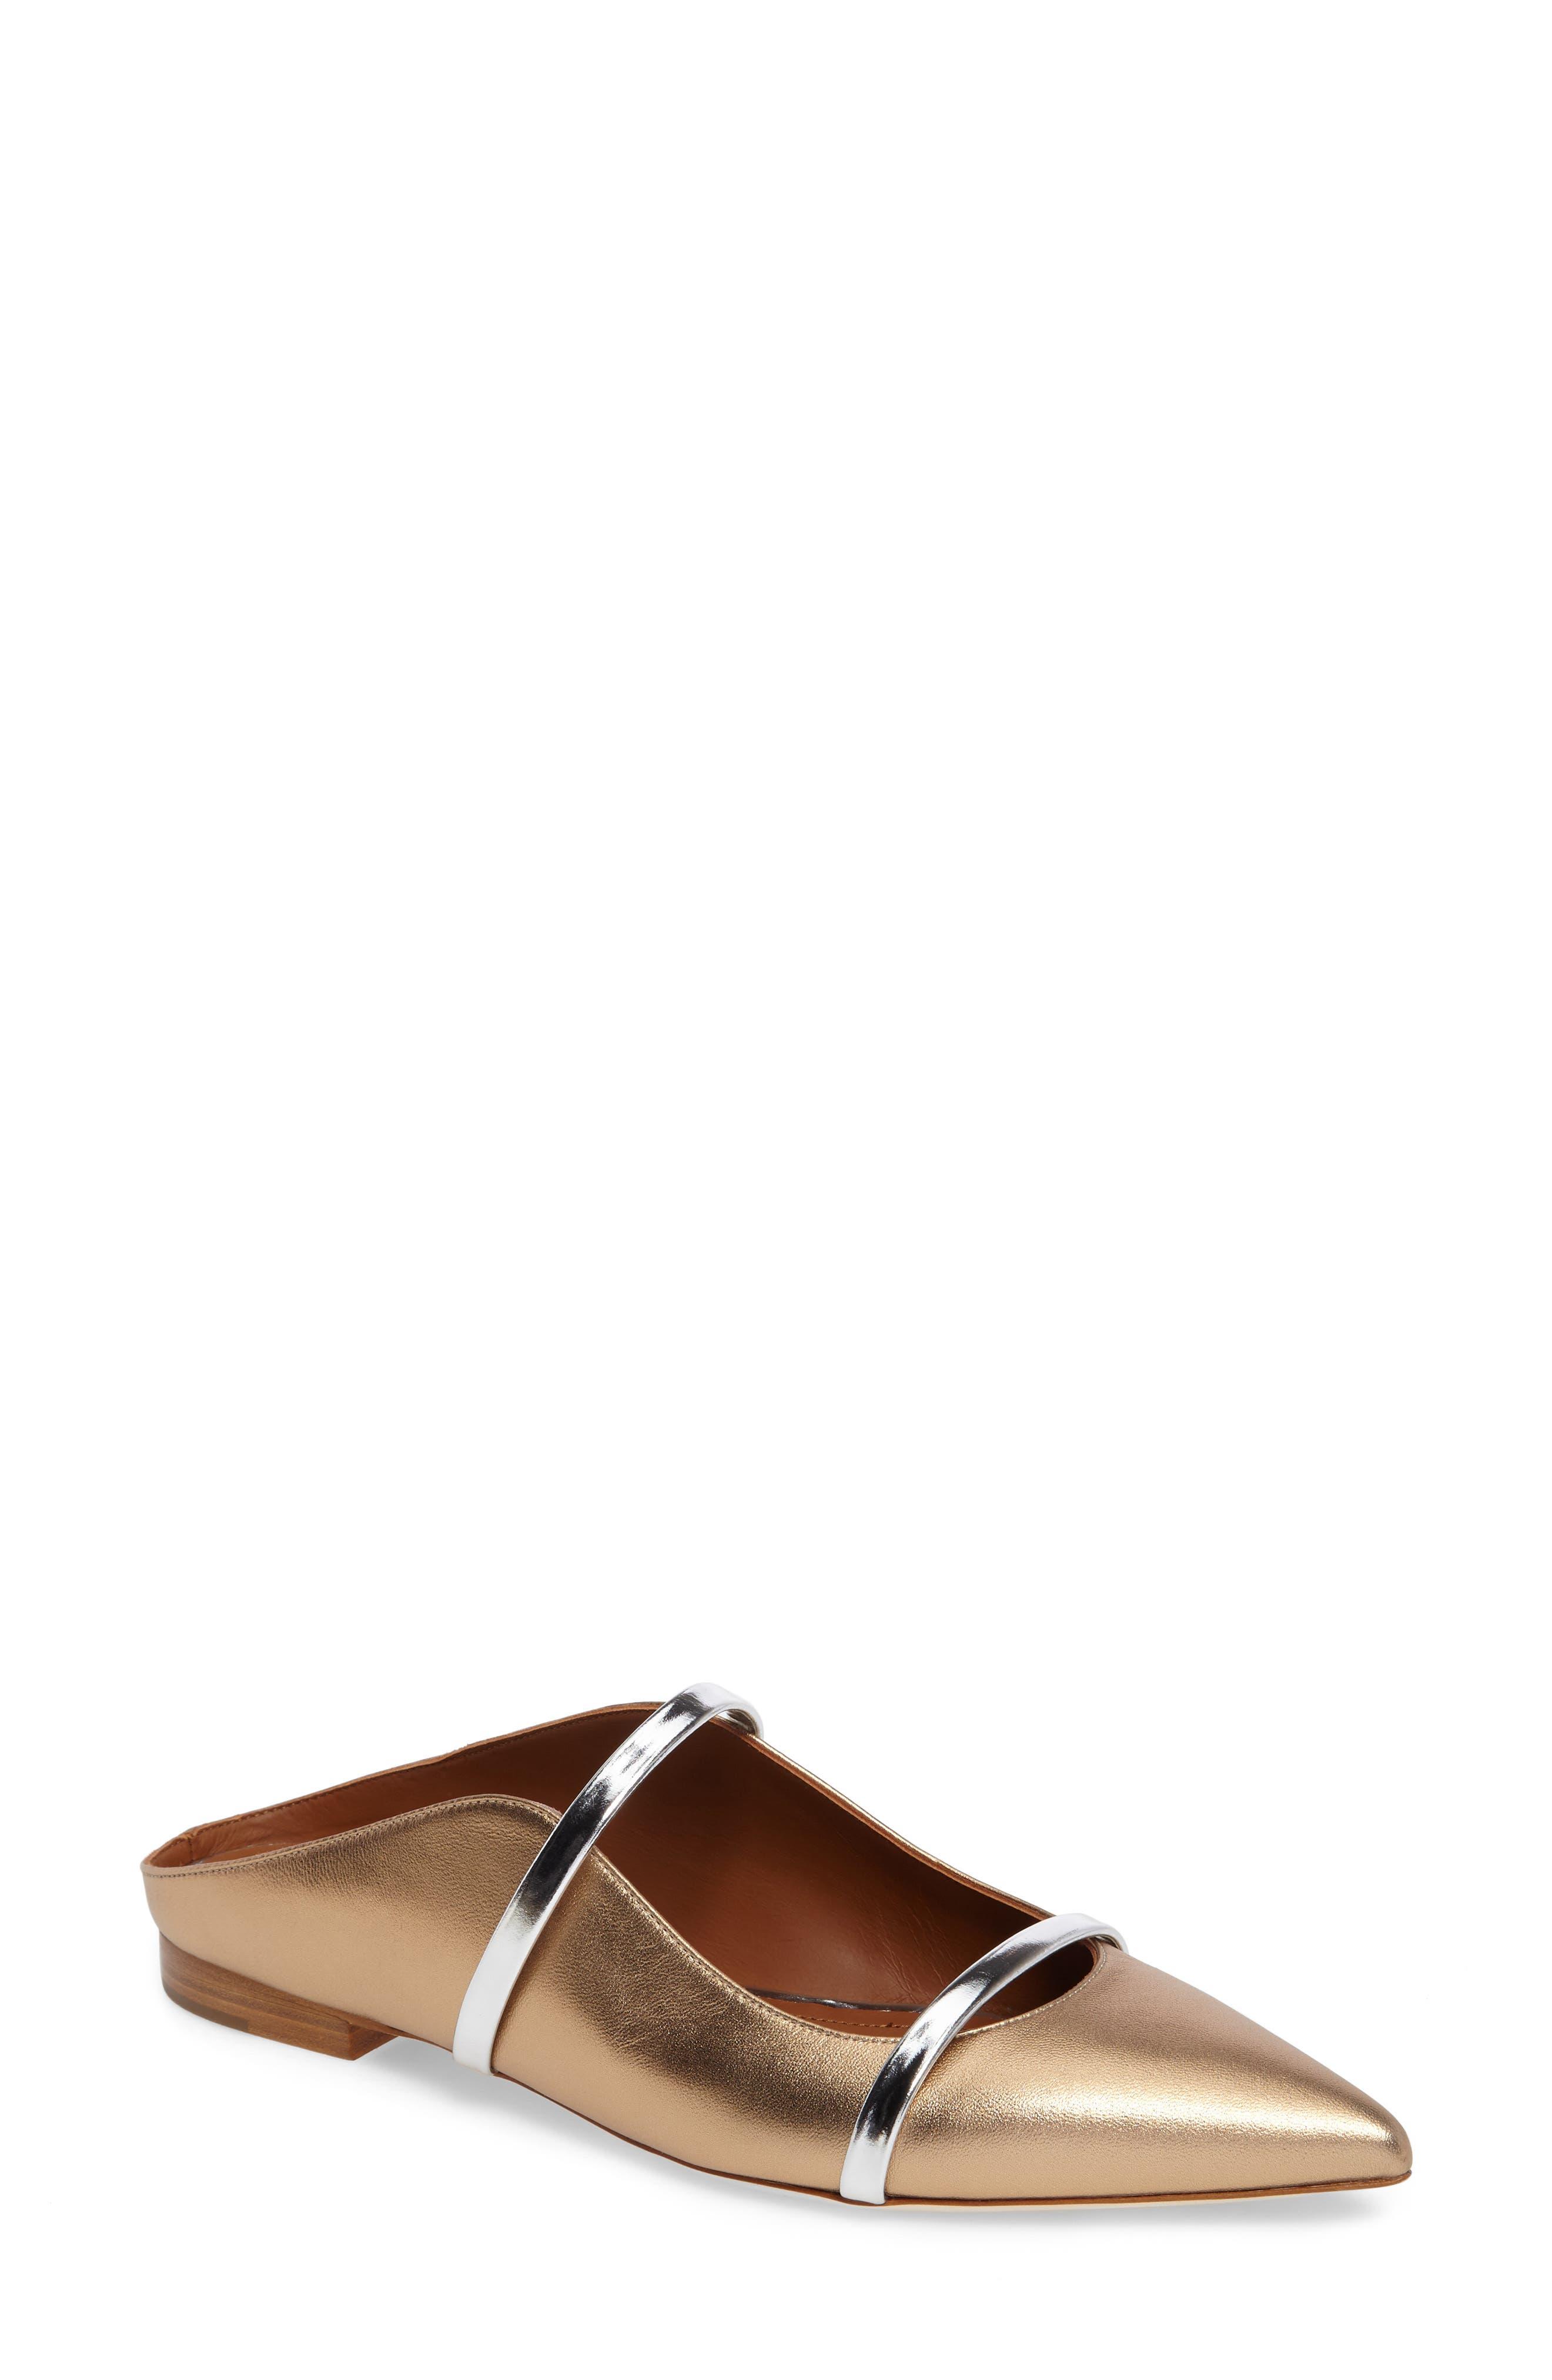 Malone Souliers Maureen Pointy Toe Flat, Metallic